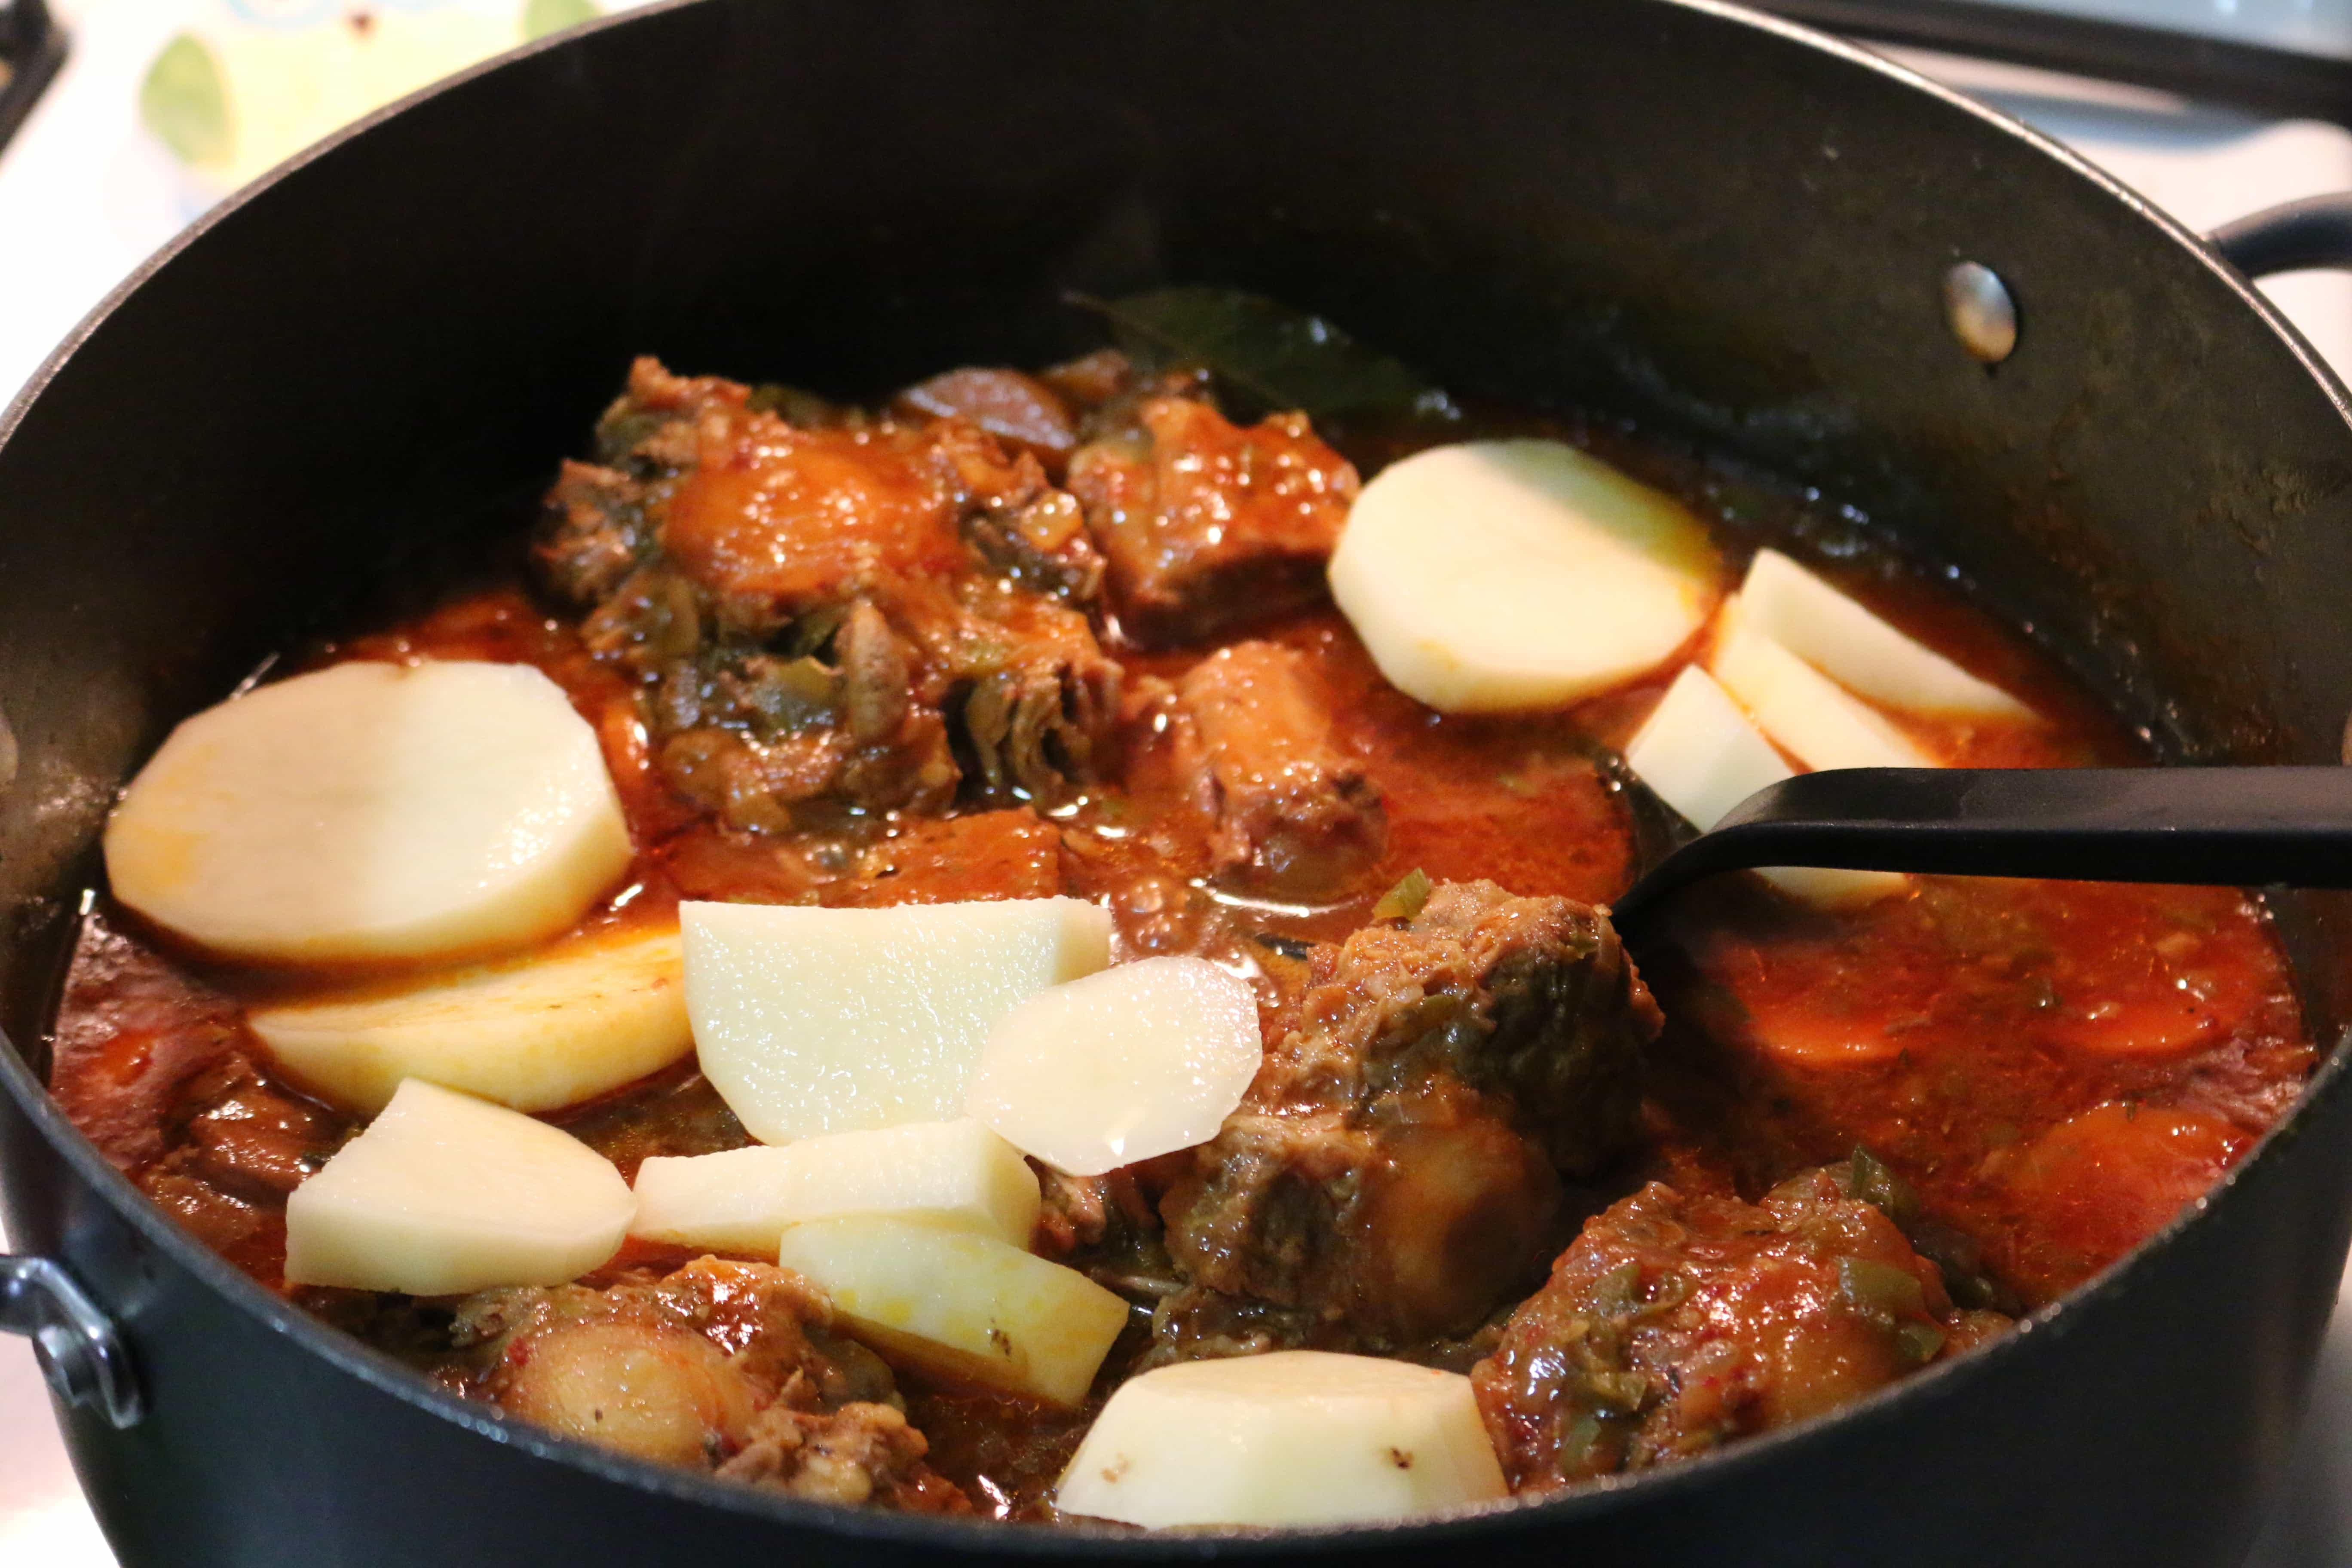 Rumba-Meats-Guisado-de-Rabo-de-Res-Oax-Tail-Stew